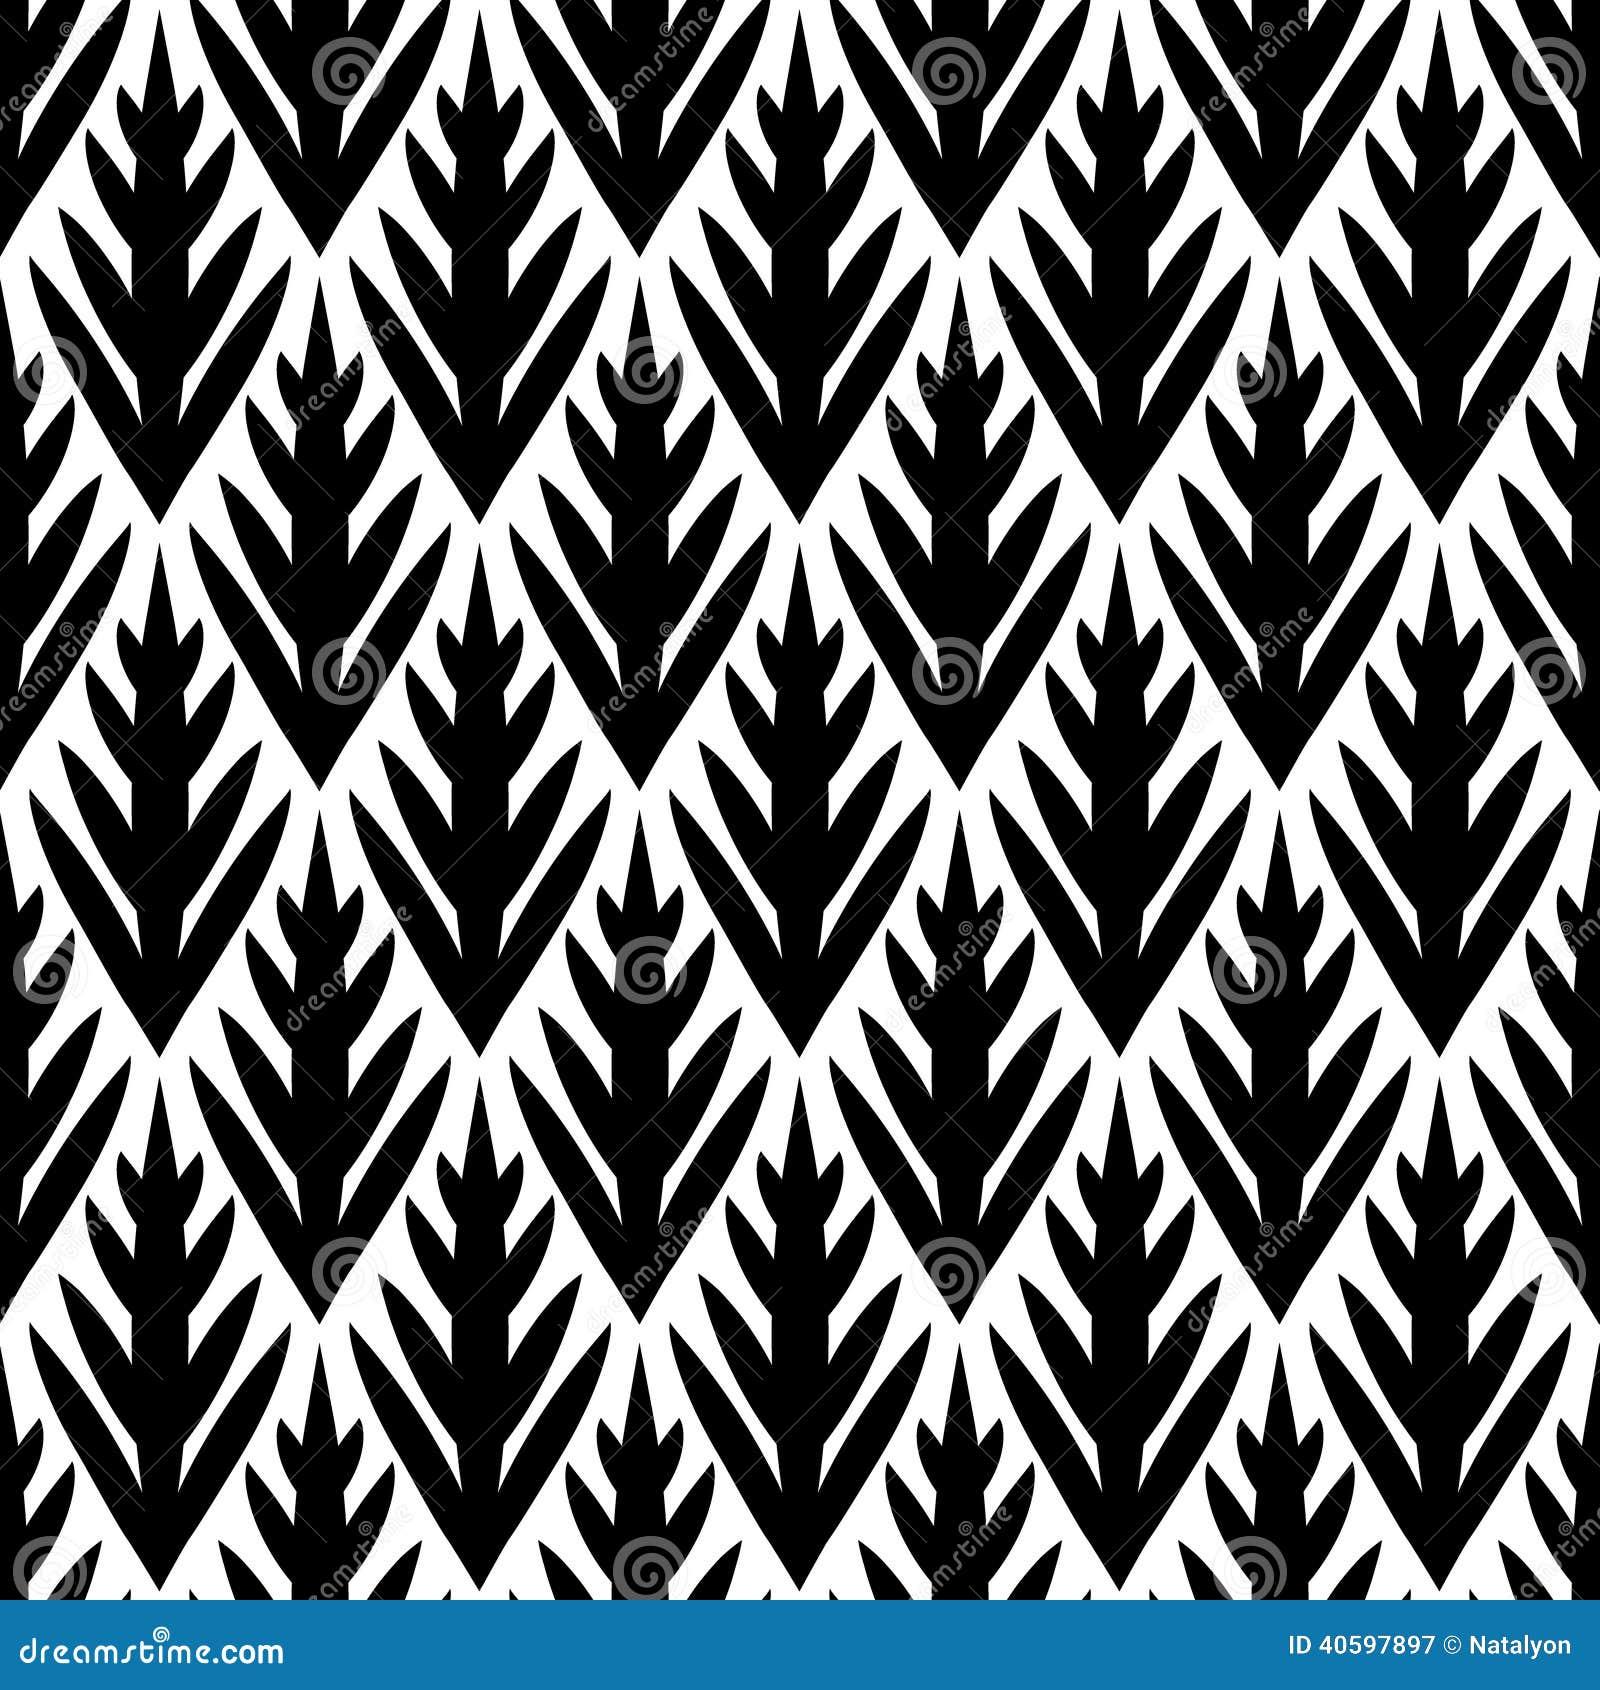 Black And White Simple Trees Geometric Ikat Seamless